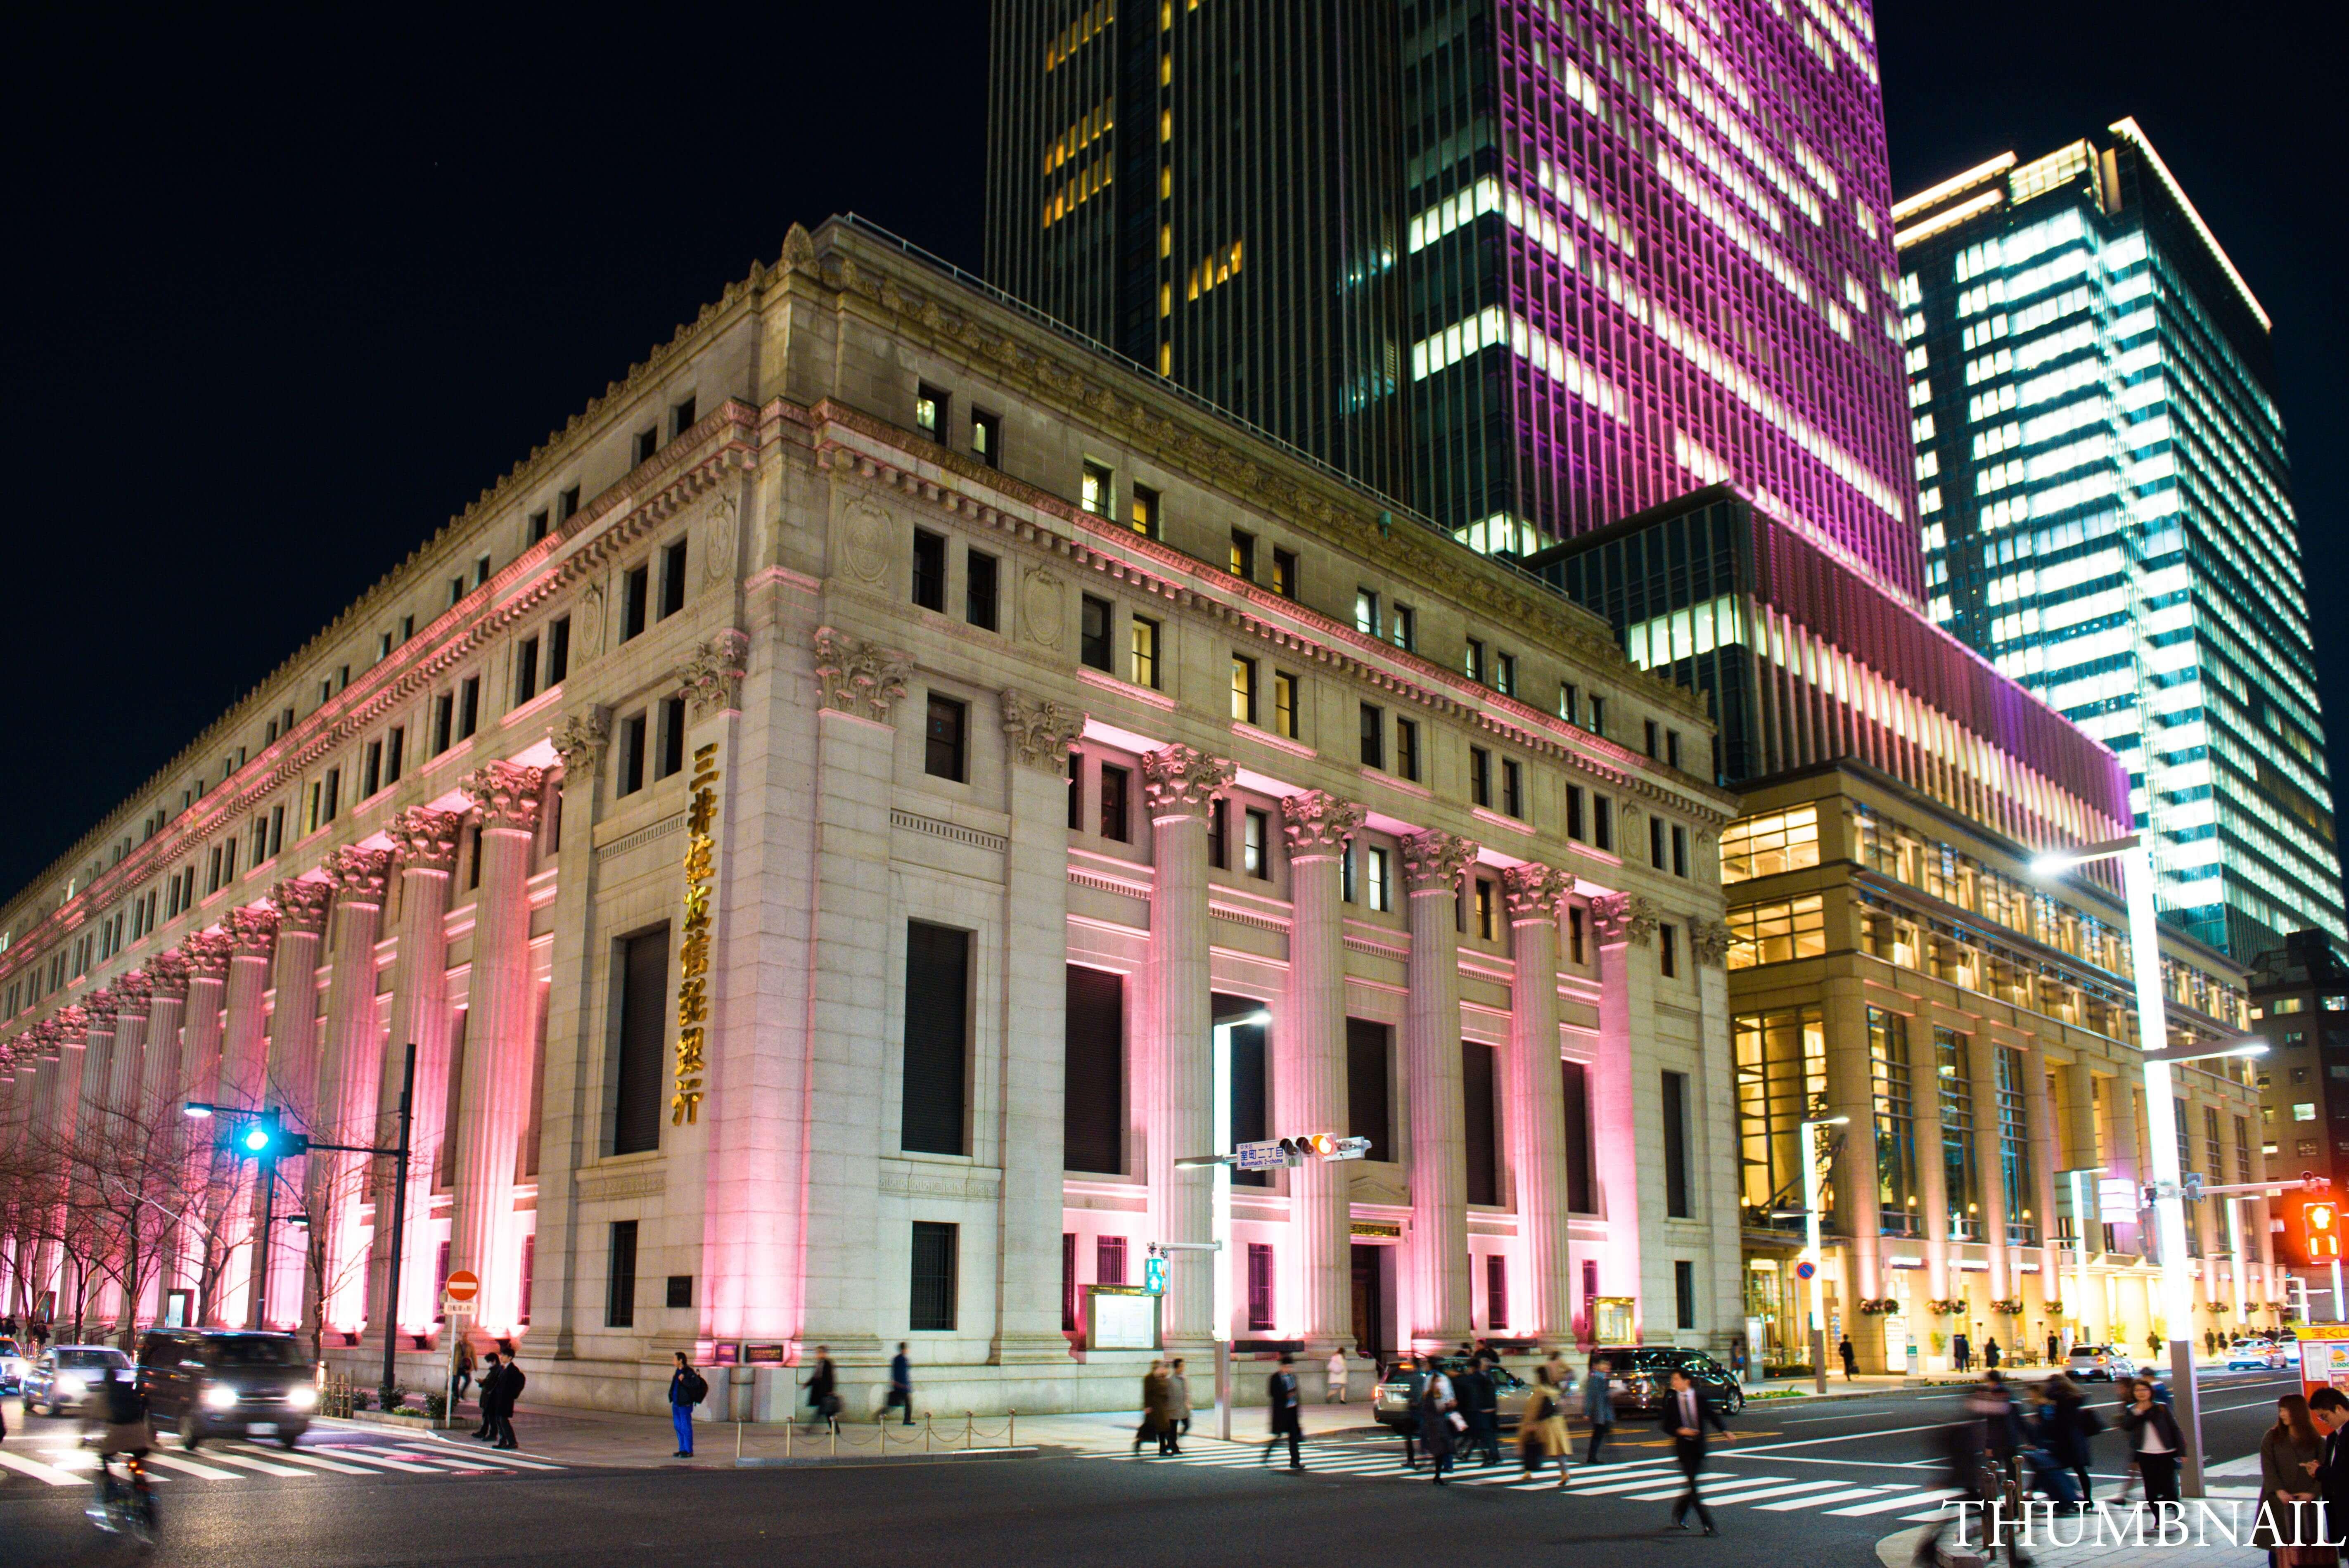 SAKURA FES NIHONBASHI_OFF TO MEET 日本橋 桜 フェス_Sakura Light Up_三井本館+三井タワー(過去写真)